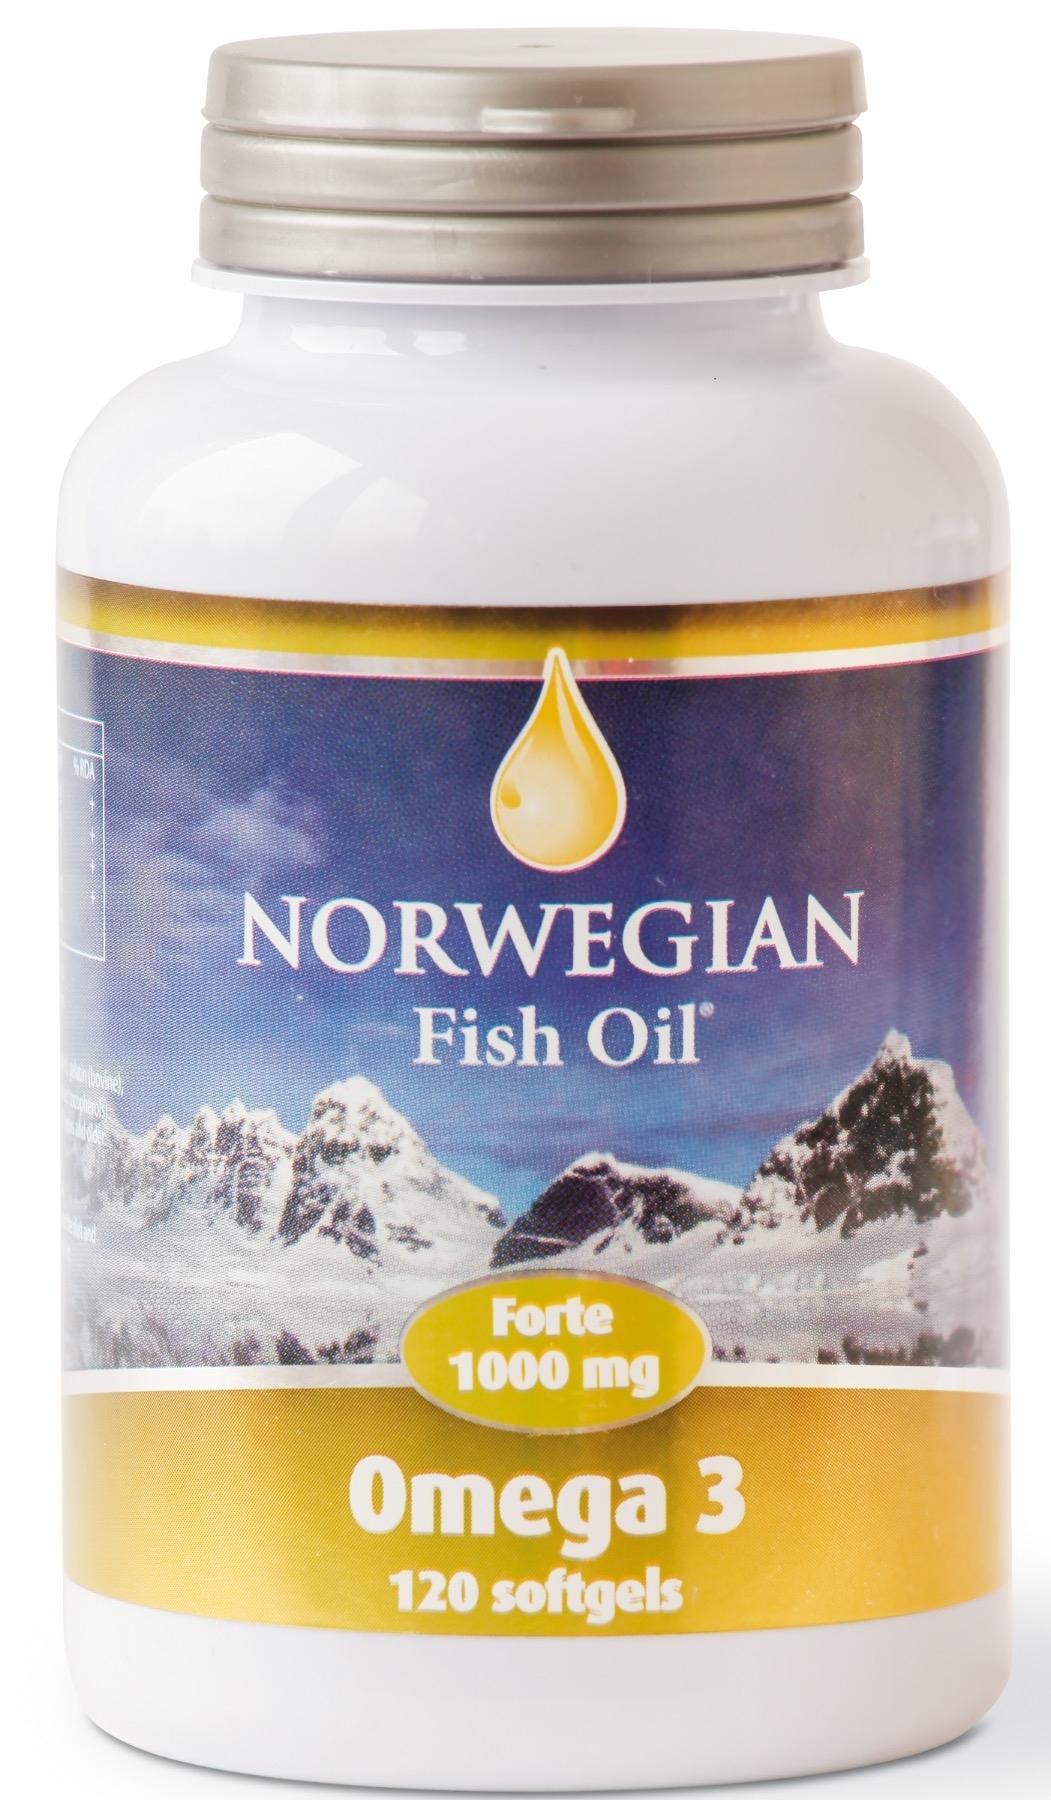 Norwegian Омега 3 Фороте NFO Omеga Forte, 120 капсул